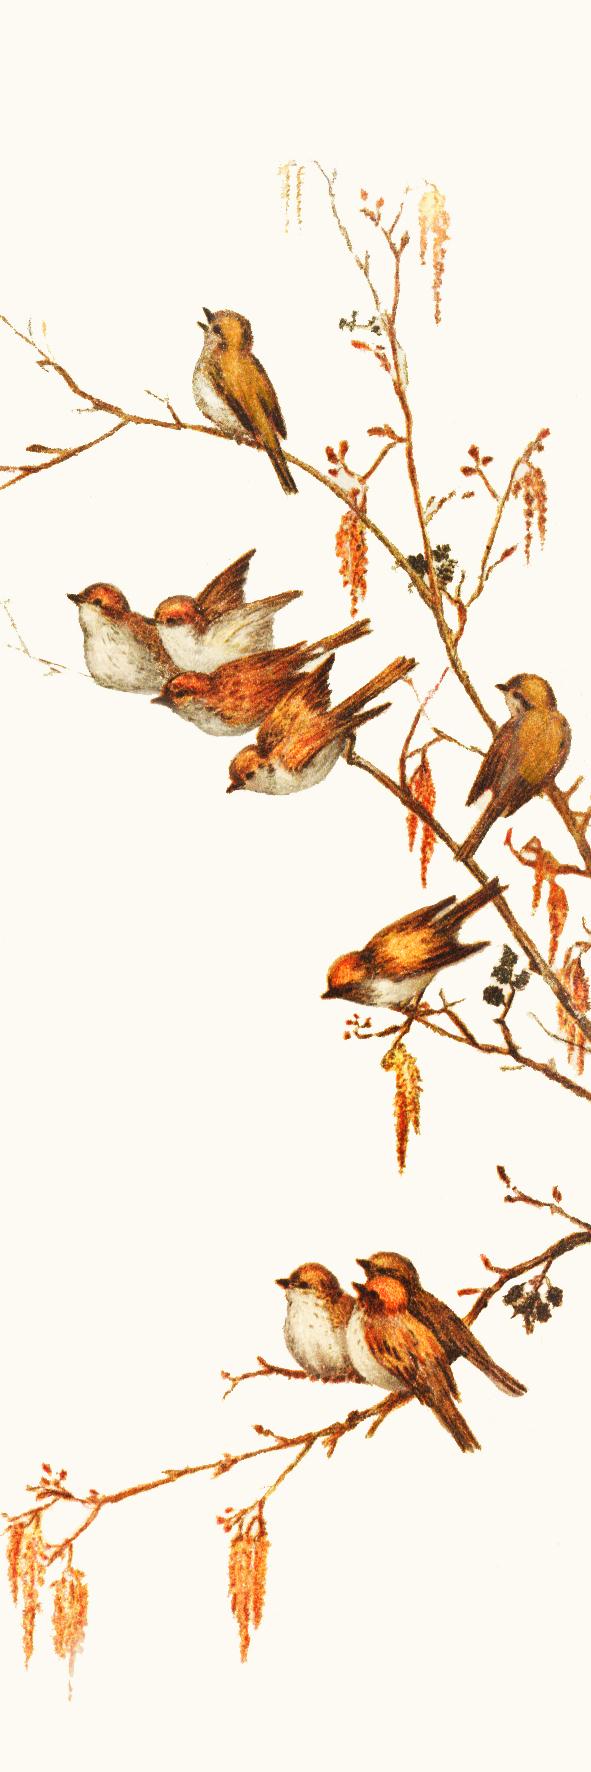 bookmark with birds